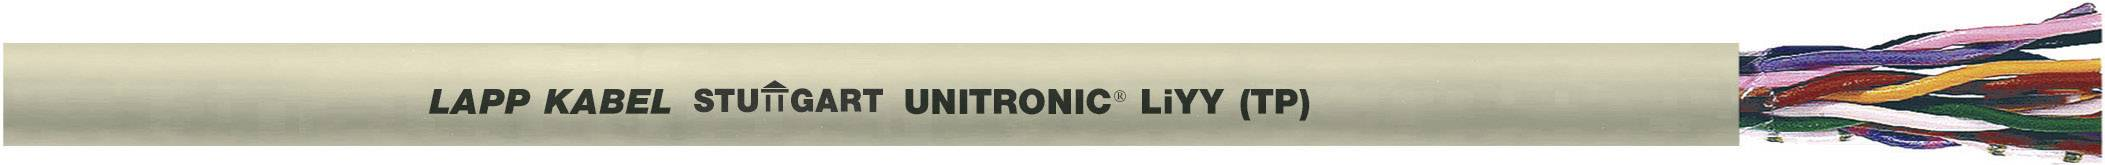 Datový kabel UNITRONIC LIYY TP10x2x0,14